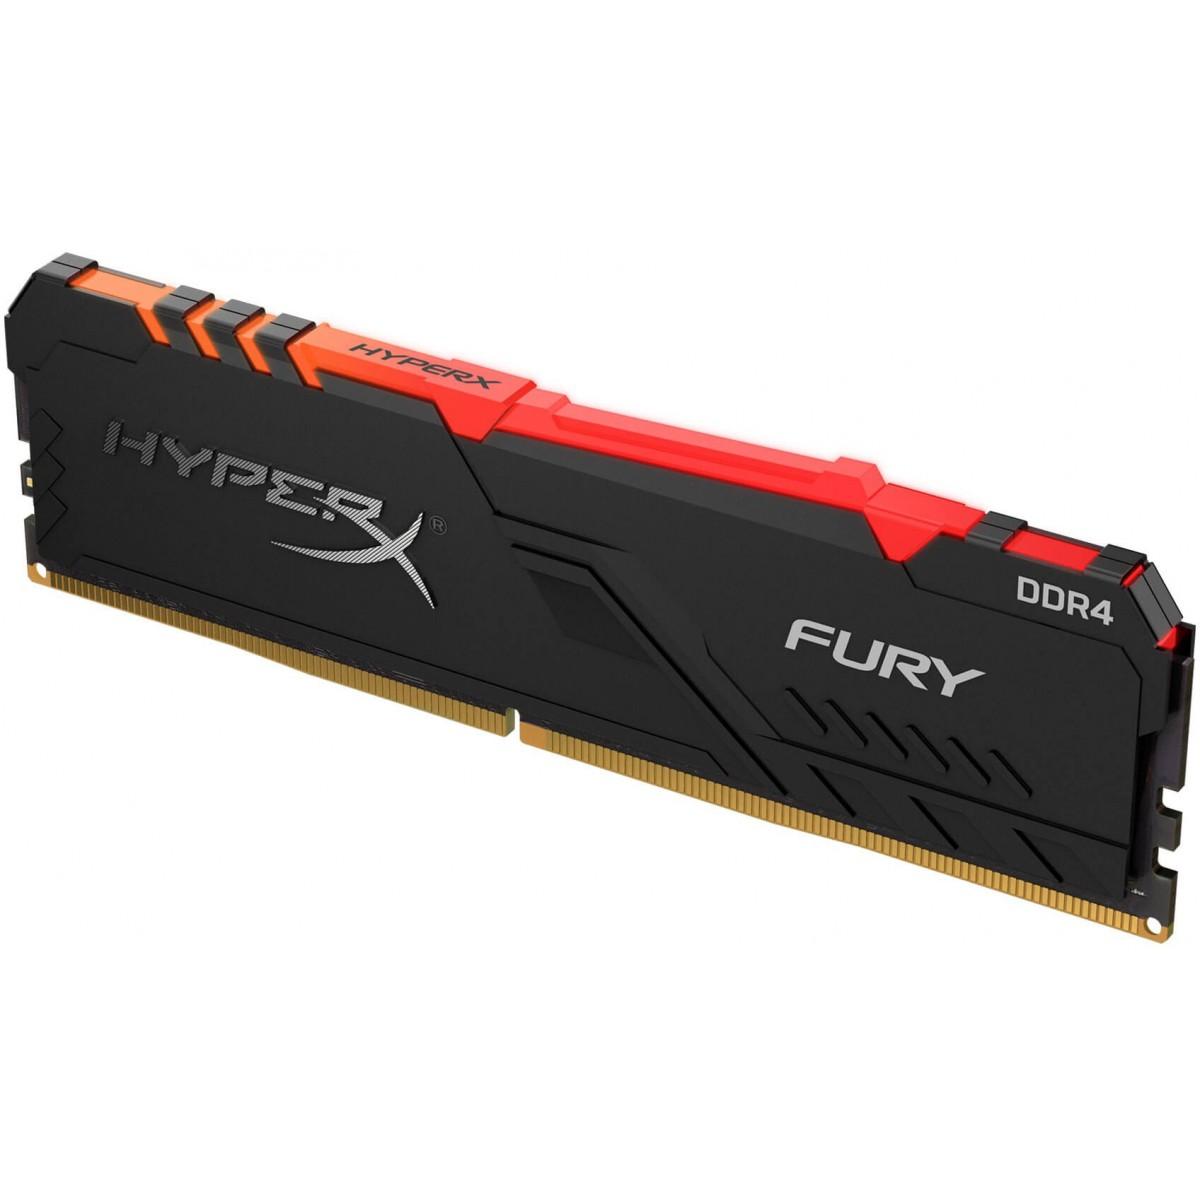 Memória DDR4 Kingston HyperX Fury RGB, 8GB 3600MHz, Black, HX436C17FB3A/8